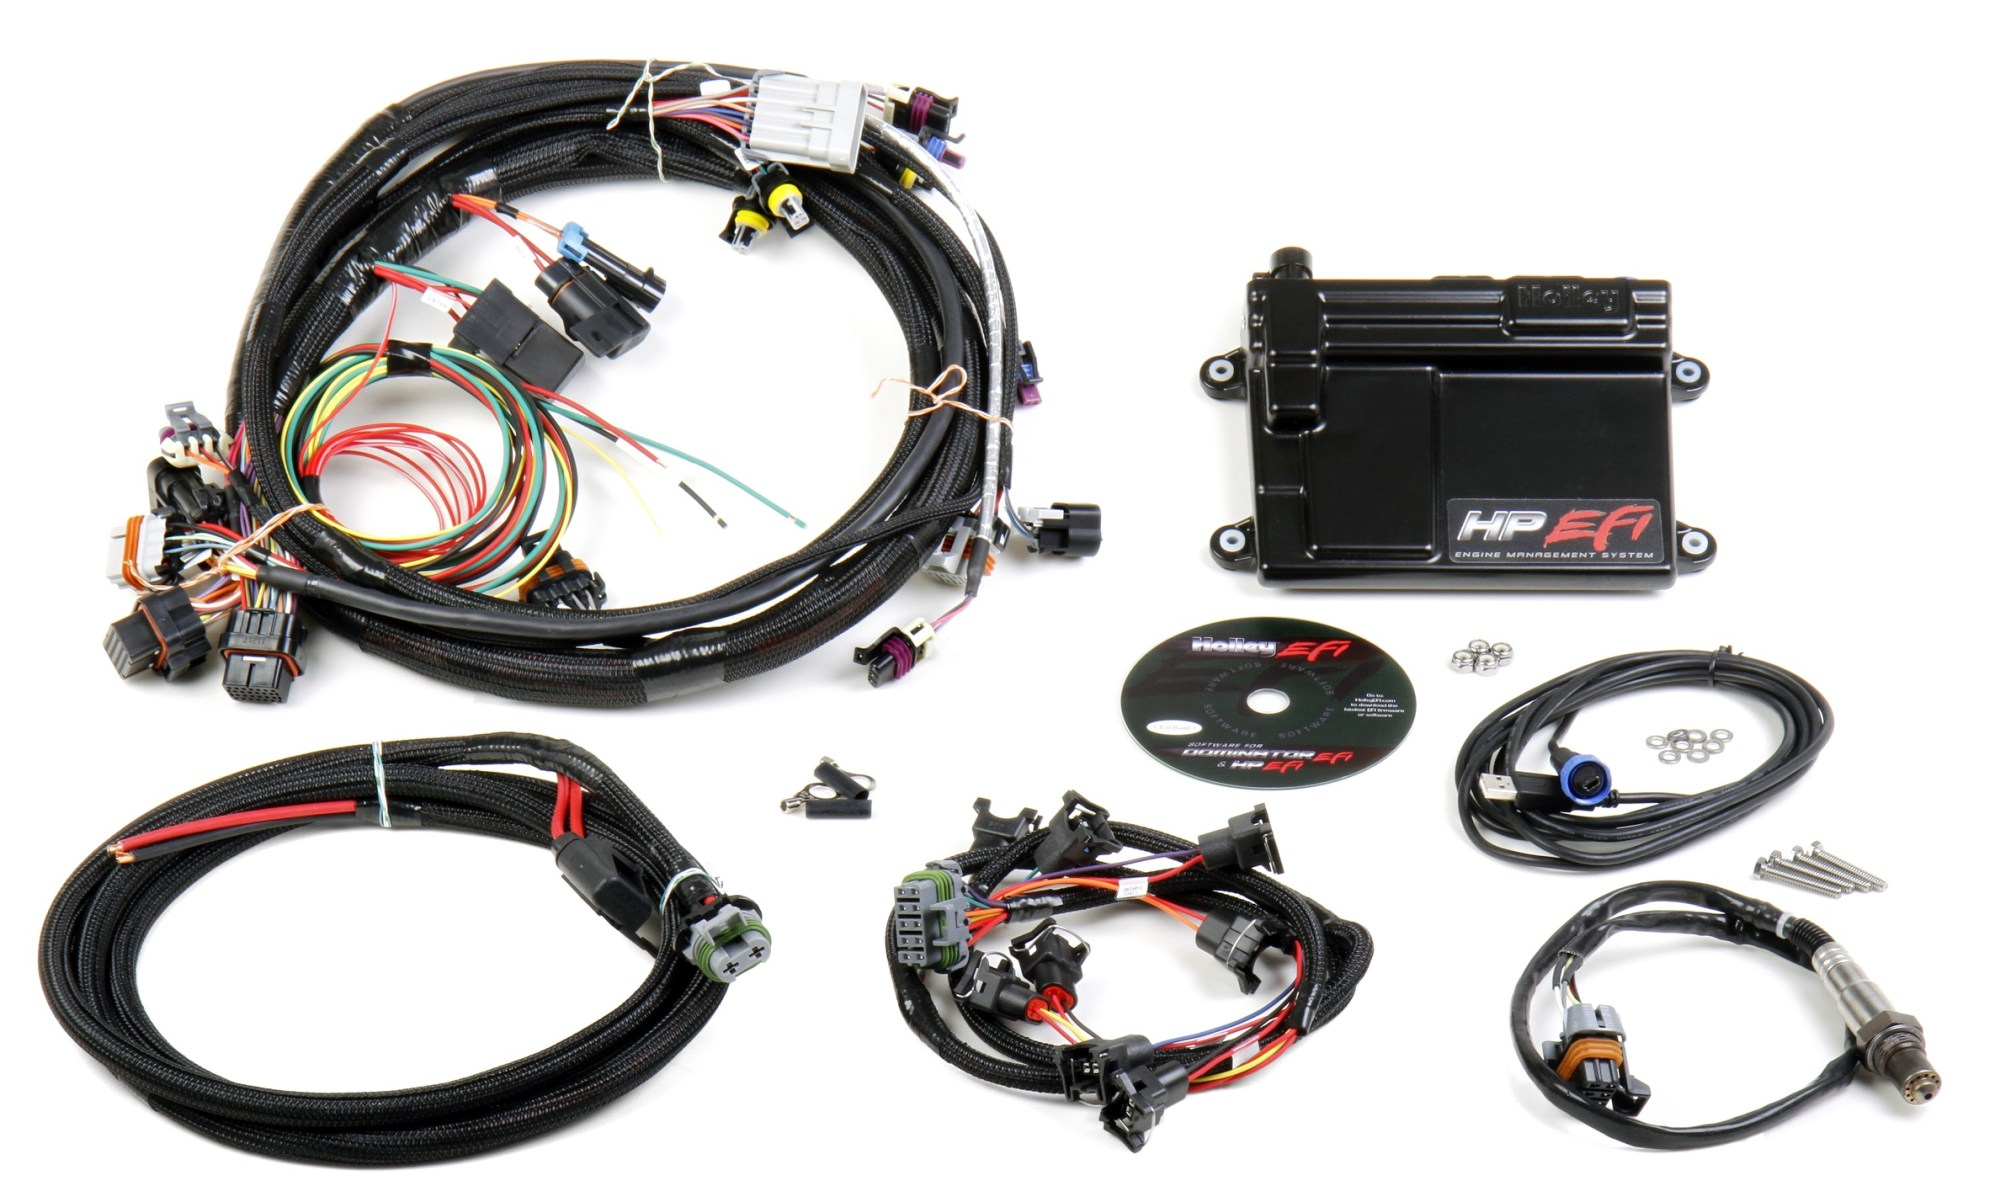 hight resolution of holley efi ls1 ls6 24x crank sensor with jetronic minitimer square injector connectors bosch sensor